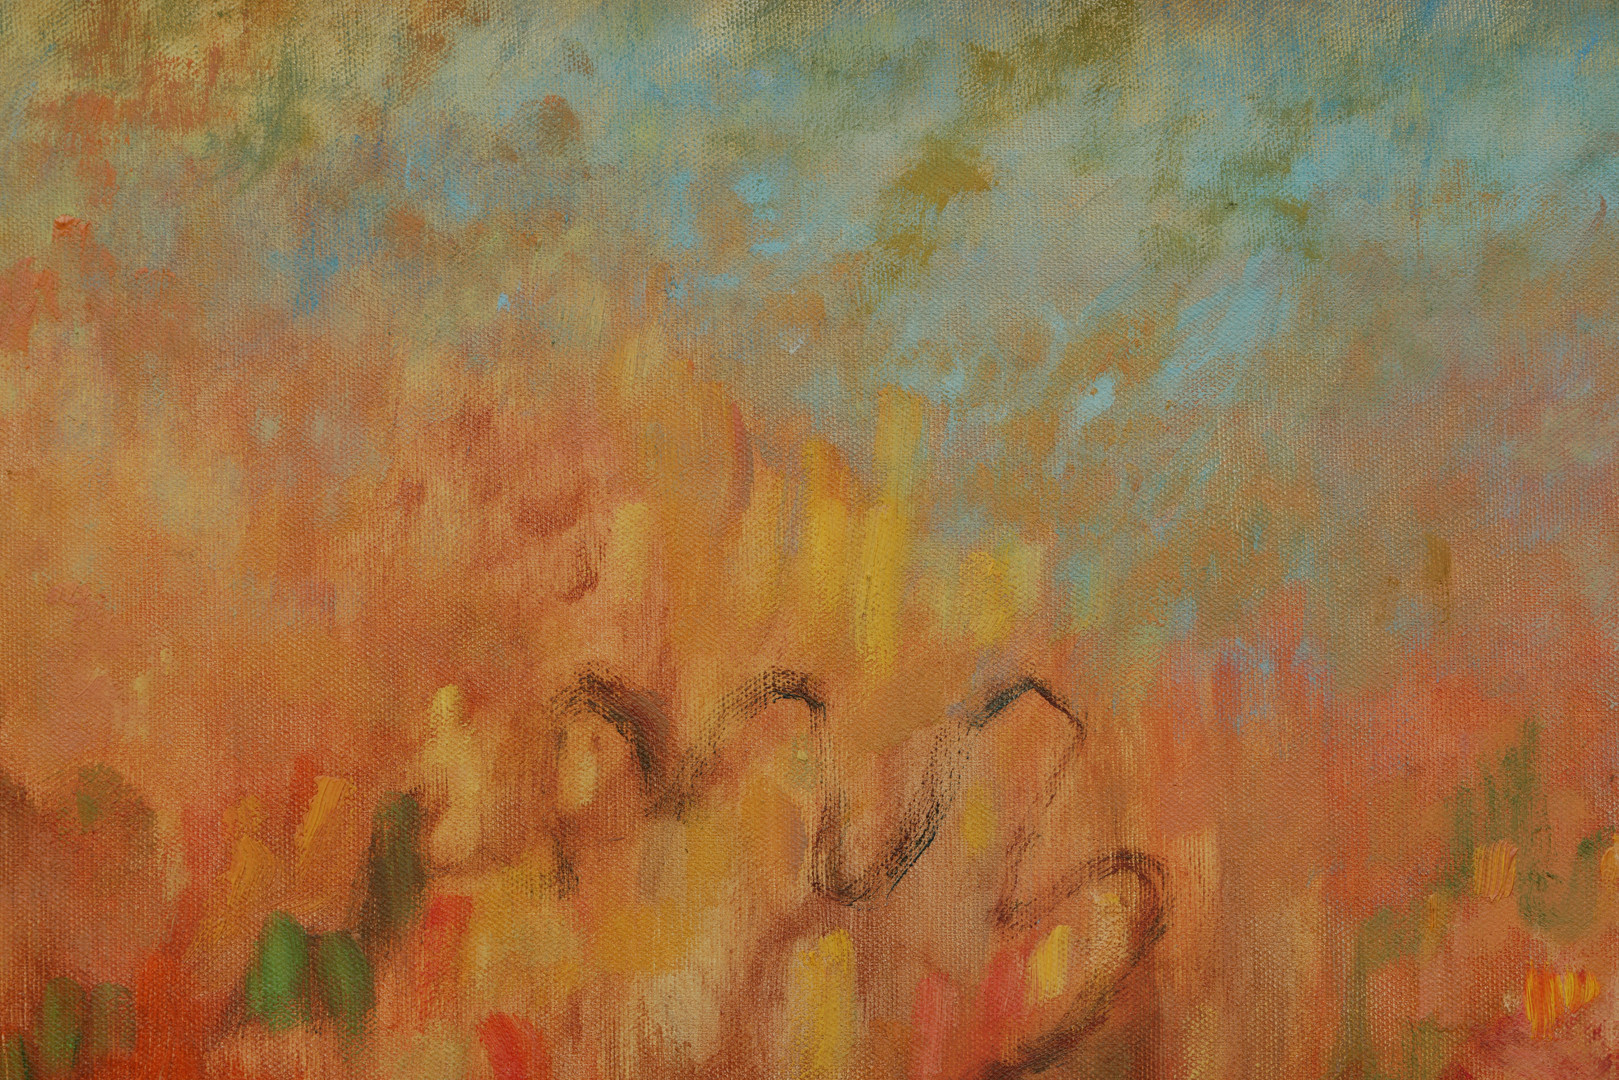 L'espérance (i girasoli di Gaguin), 2019